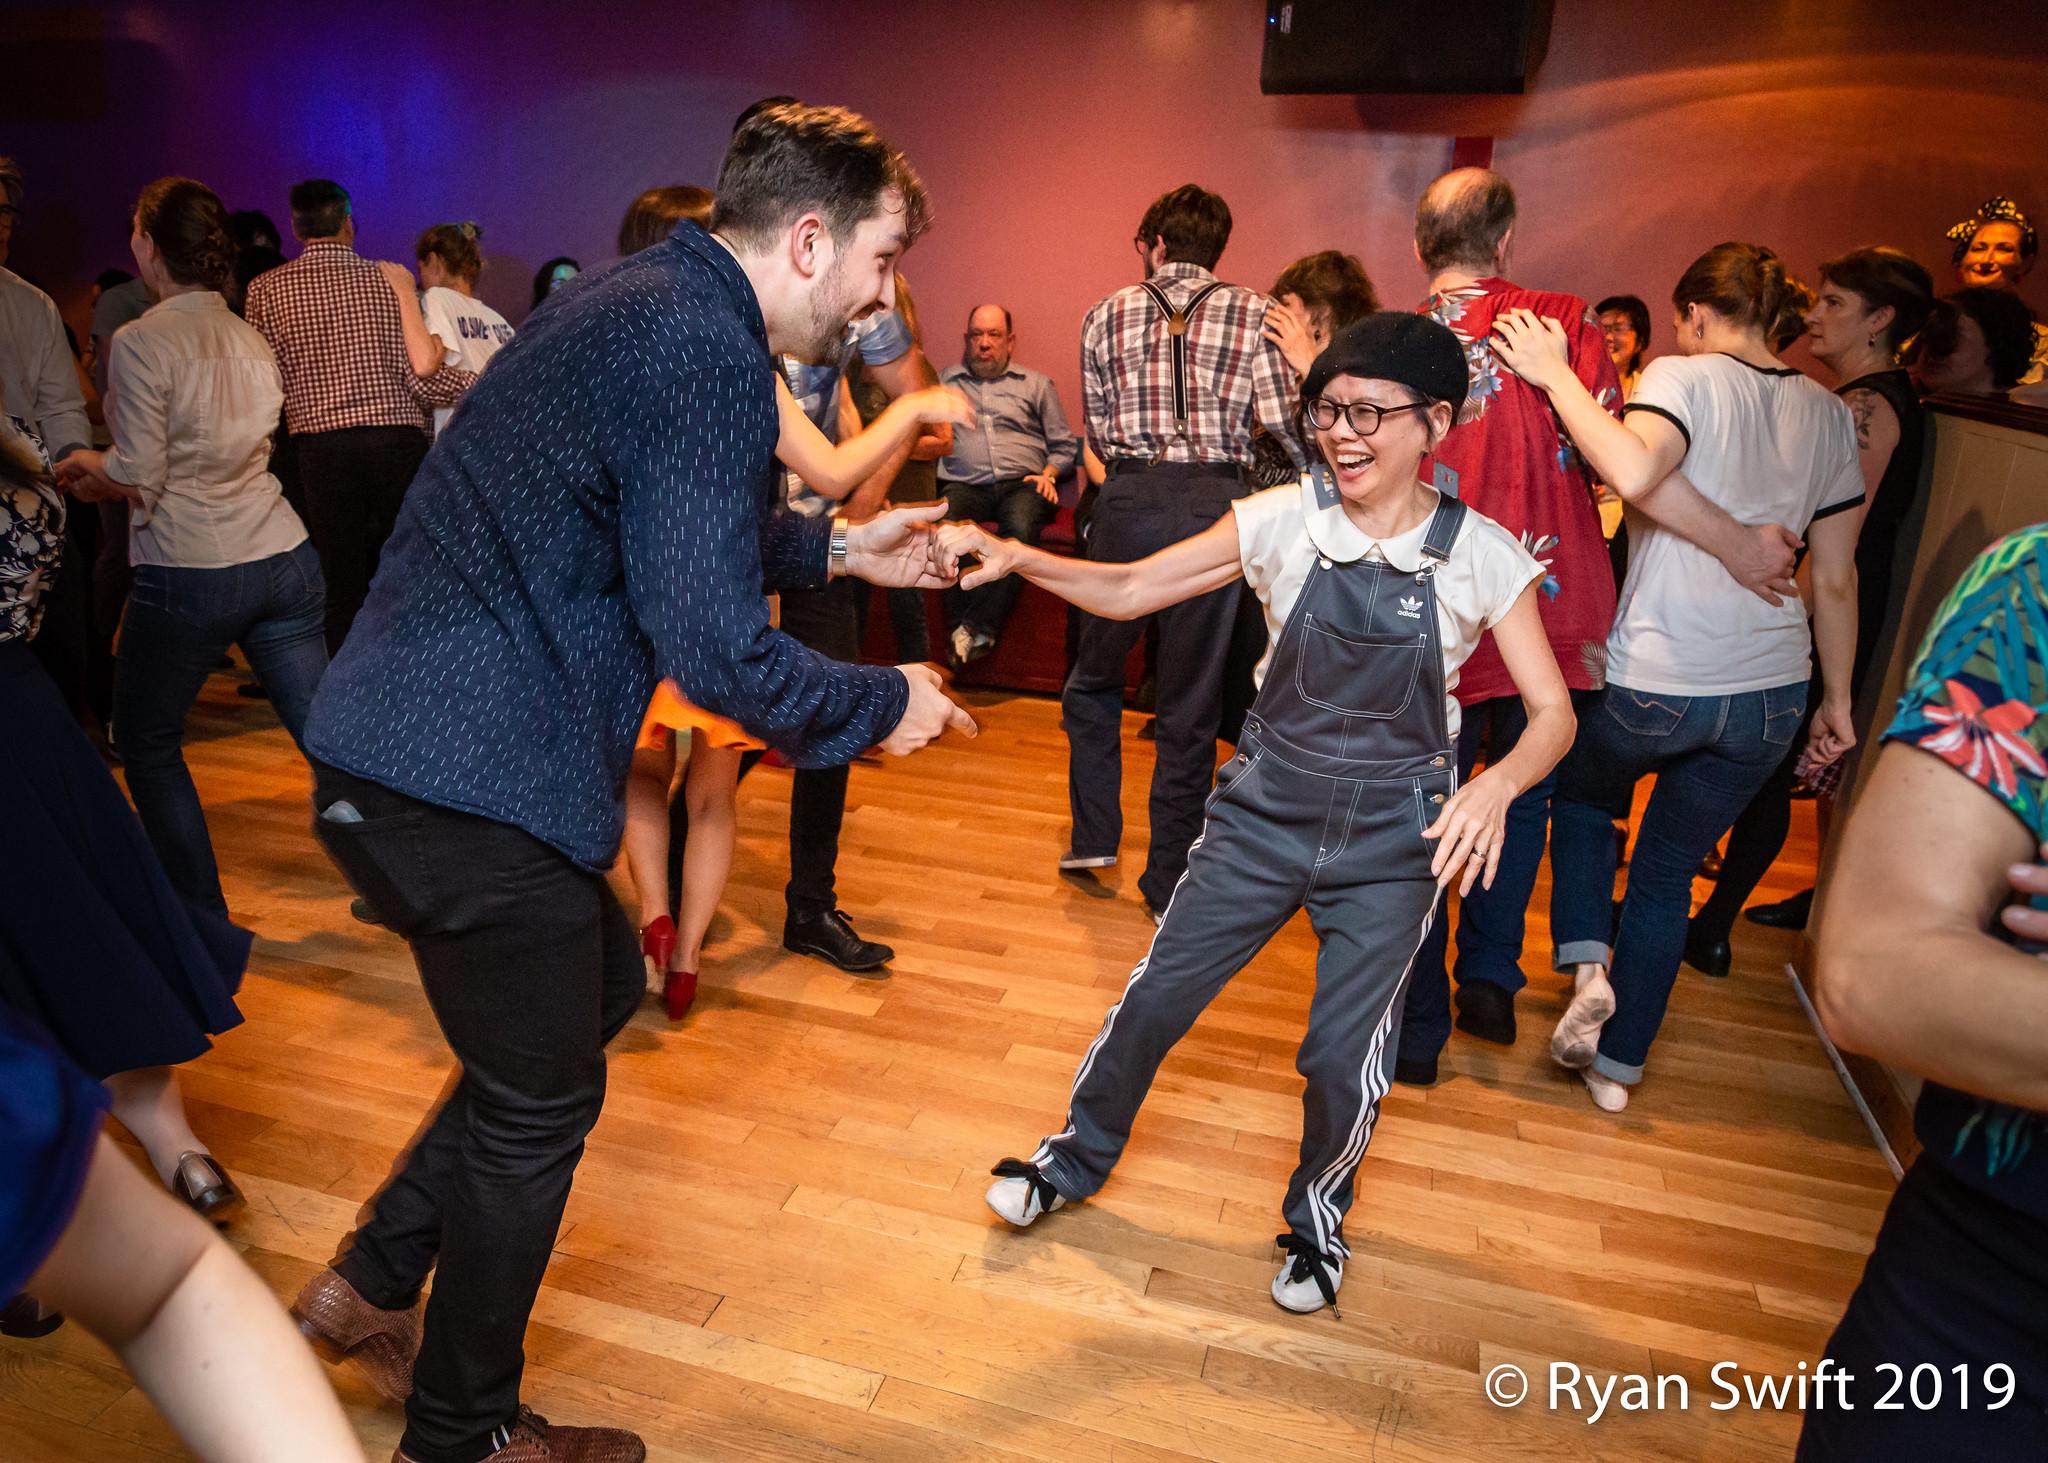 Sing Lim  dances with Adam Brozowski at  Frim Fram Jam  in NYC